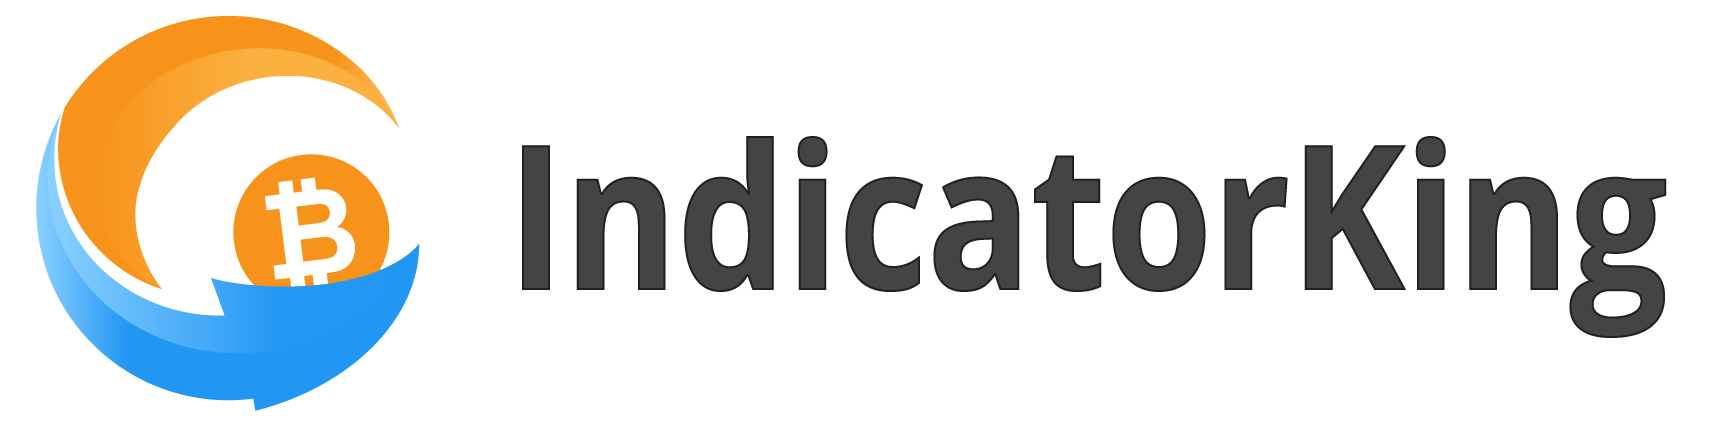 IndicatorKing